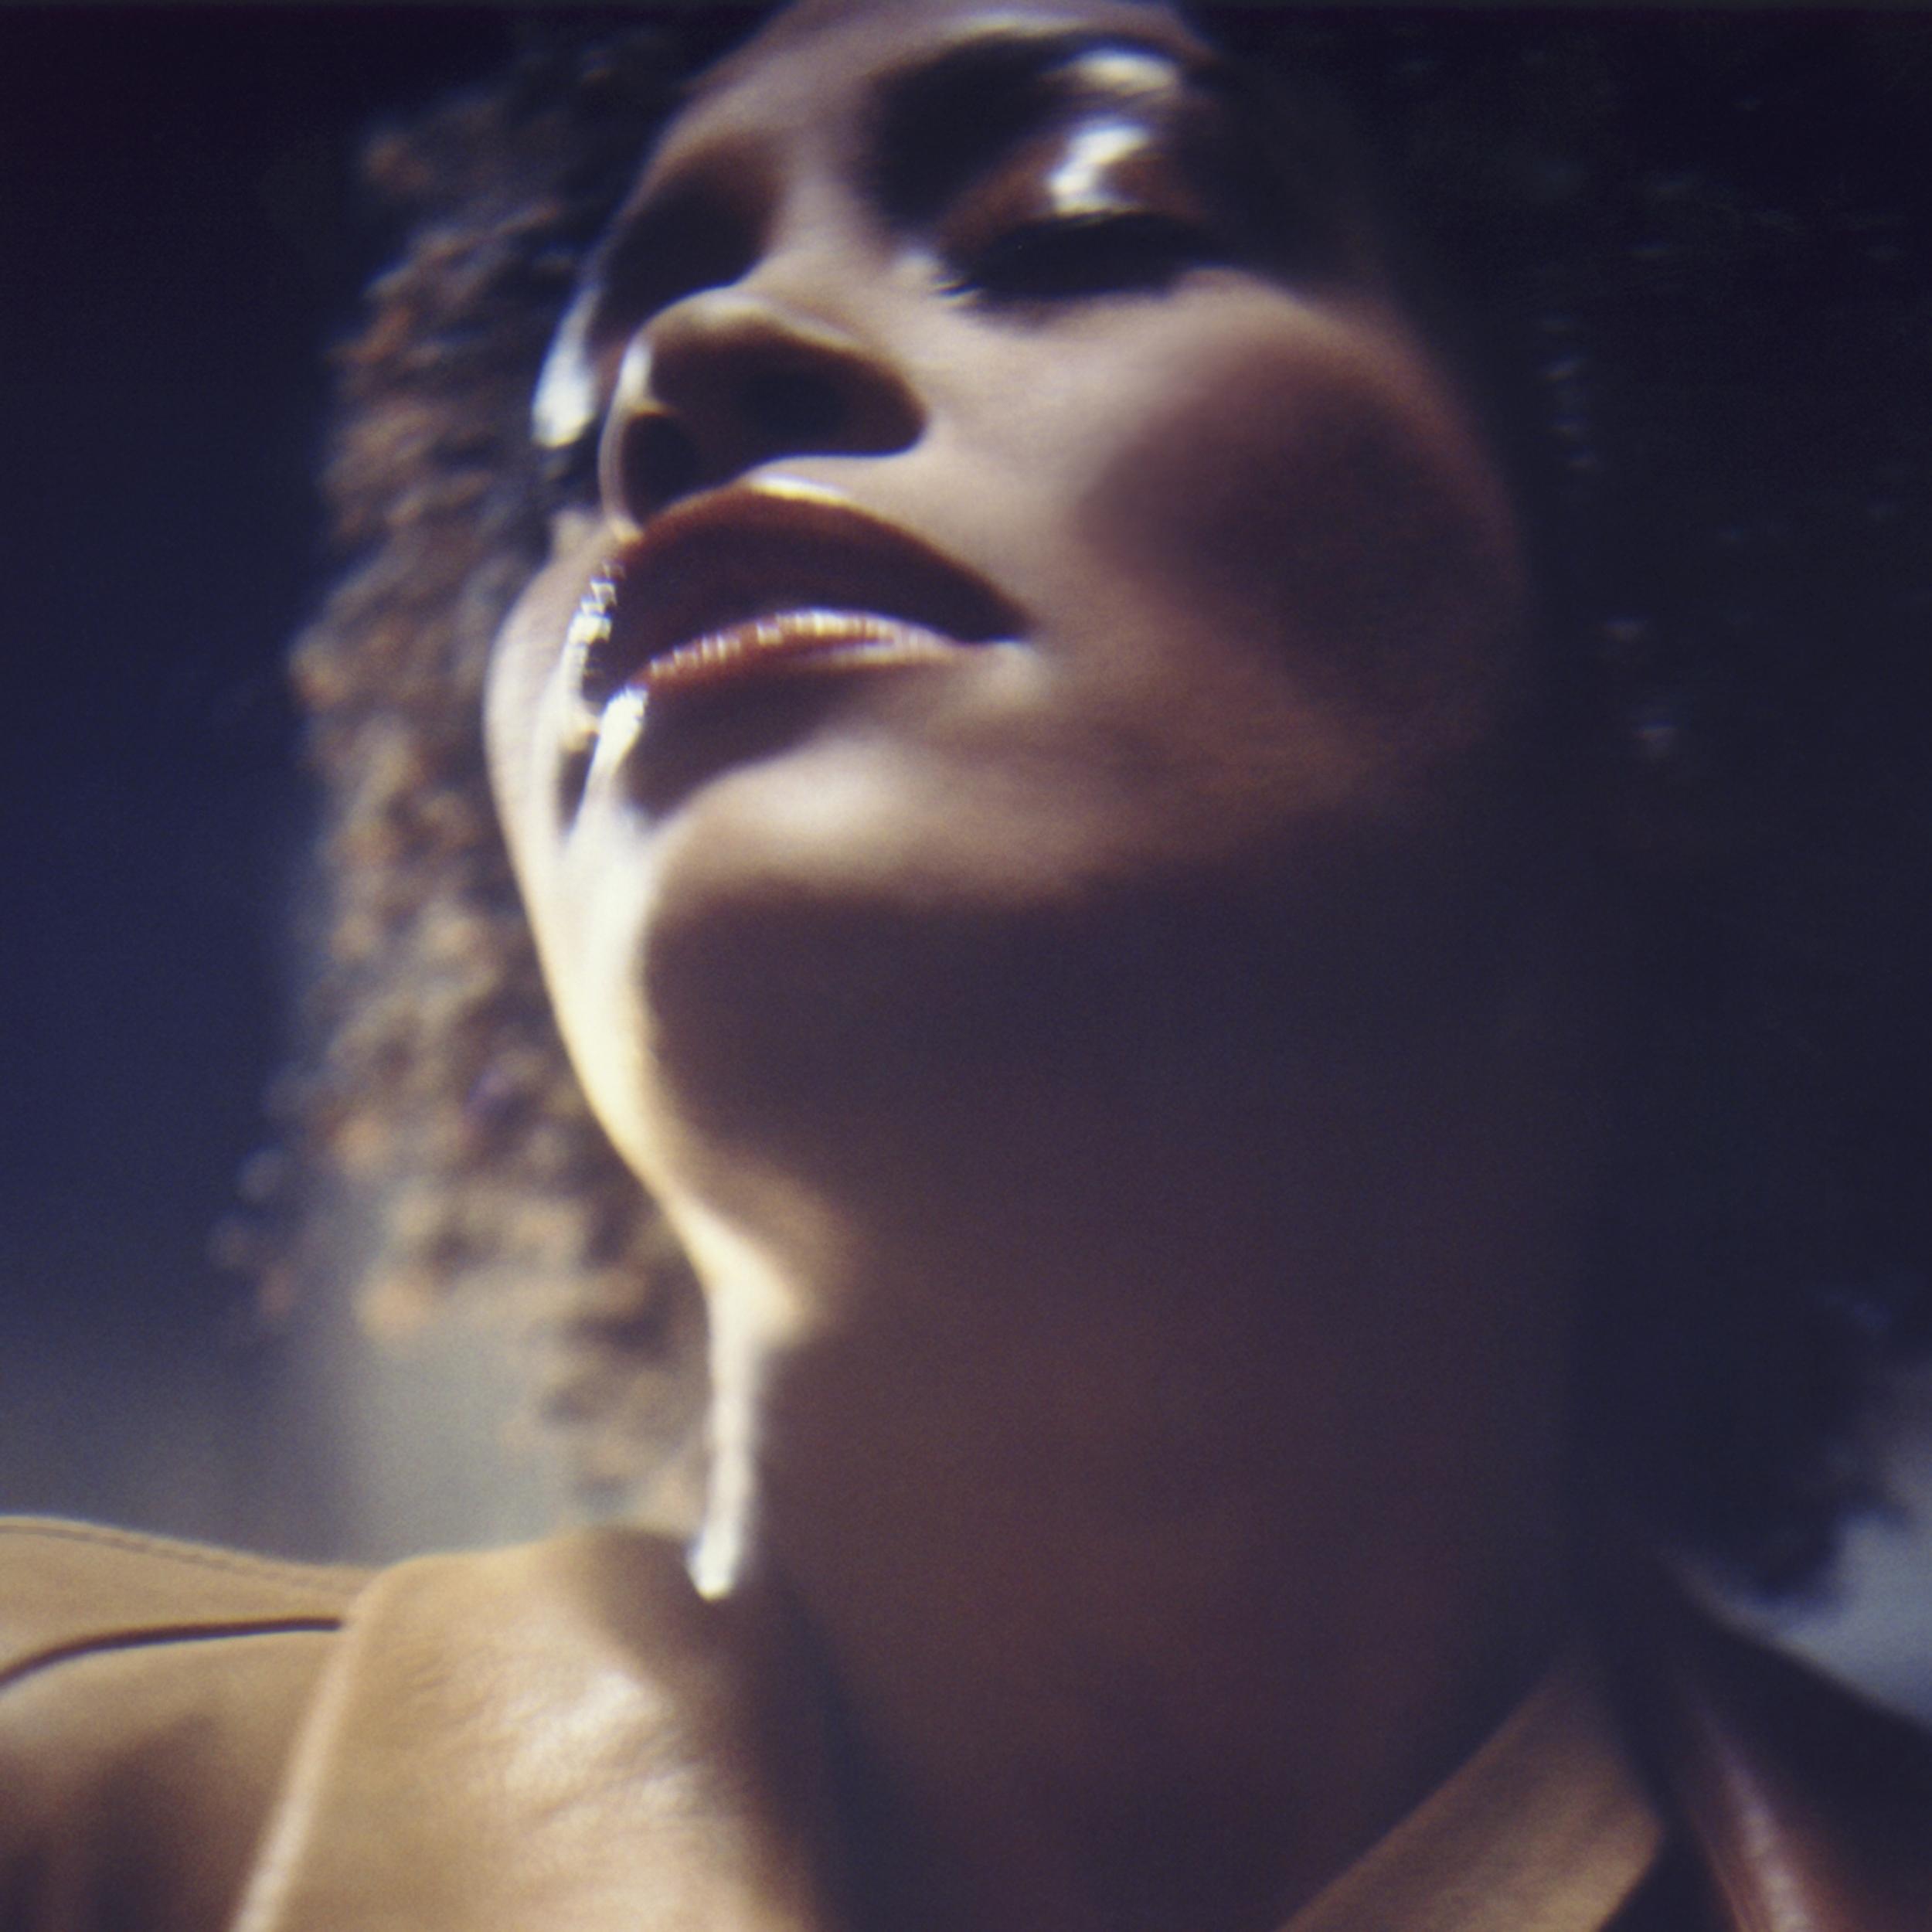 Whitney Houston by Patrik Andersson